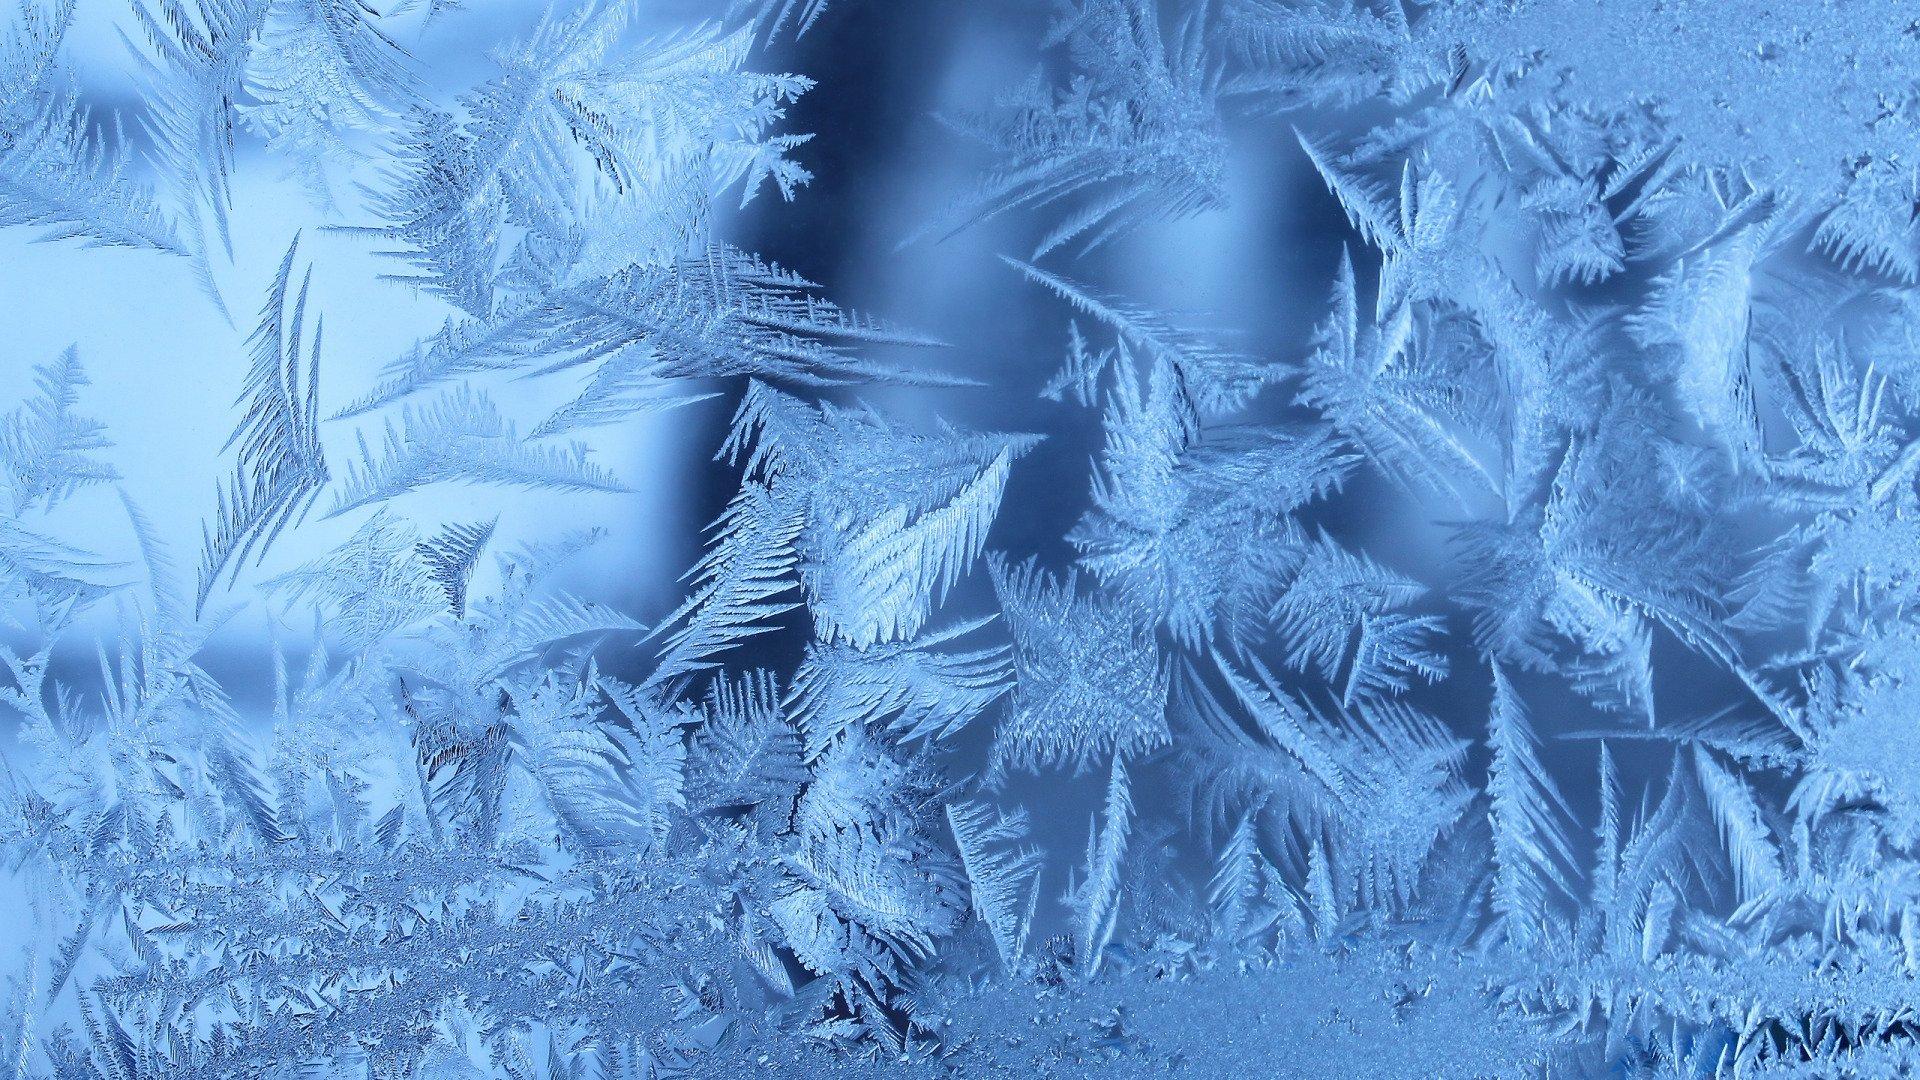 Winter Aesthetic Wallpaper Free Download